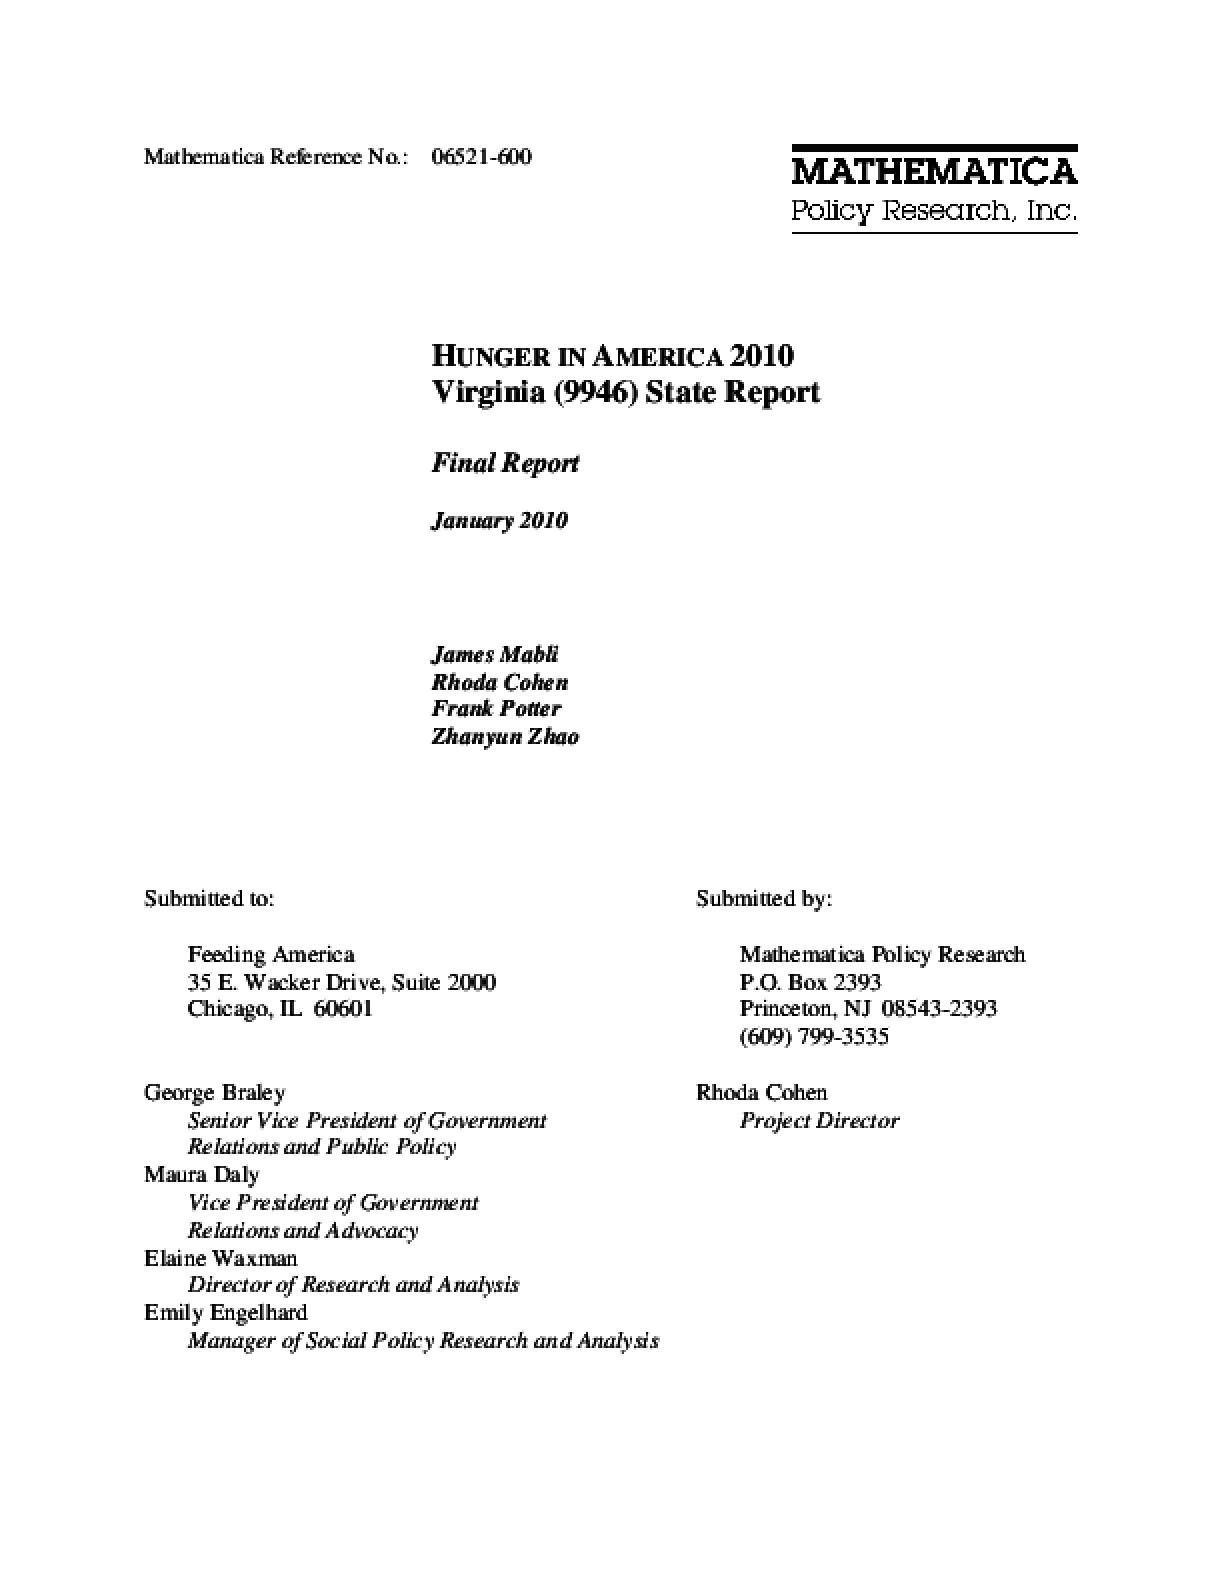 Hunger in America 2010 Virginia State Report